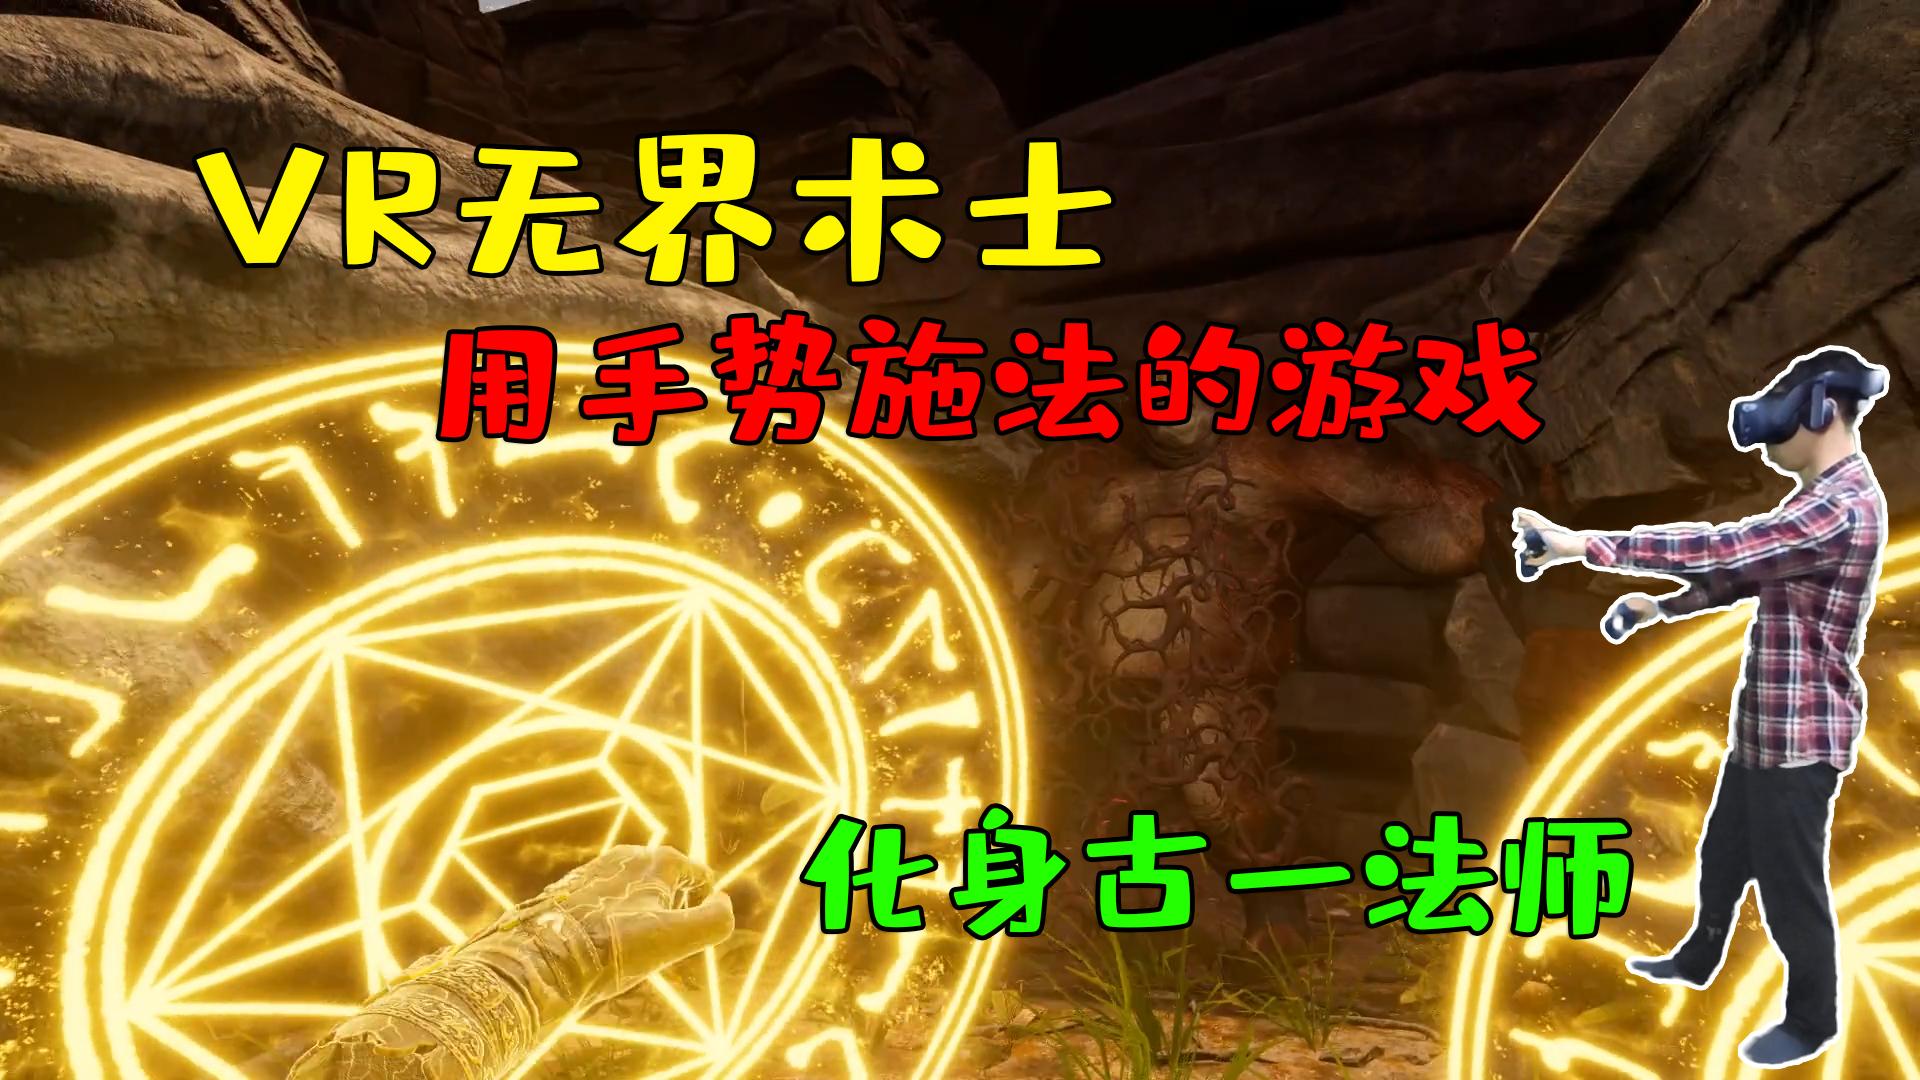 VR无界术士:中二法师怒搓螺旋丸,学会第一个范围魔法!